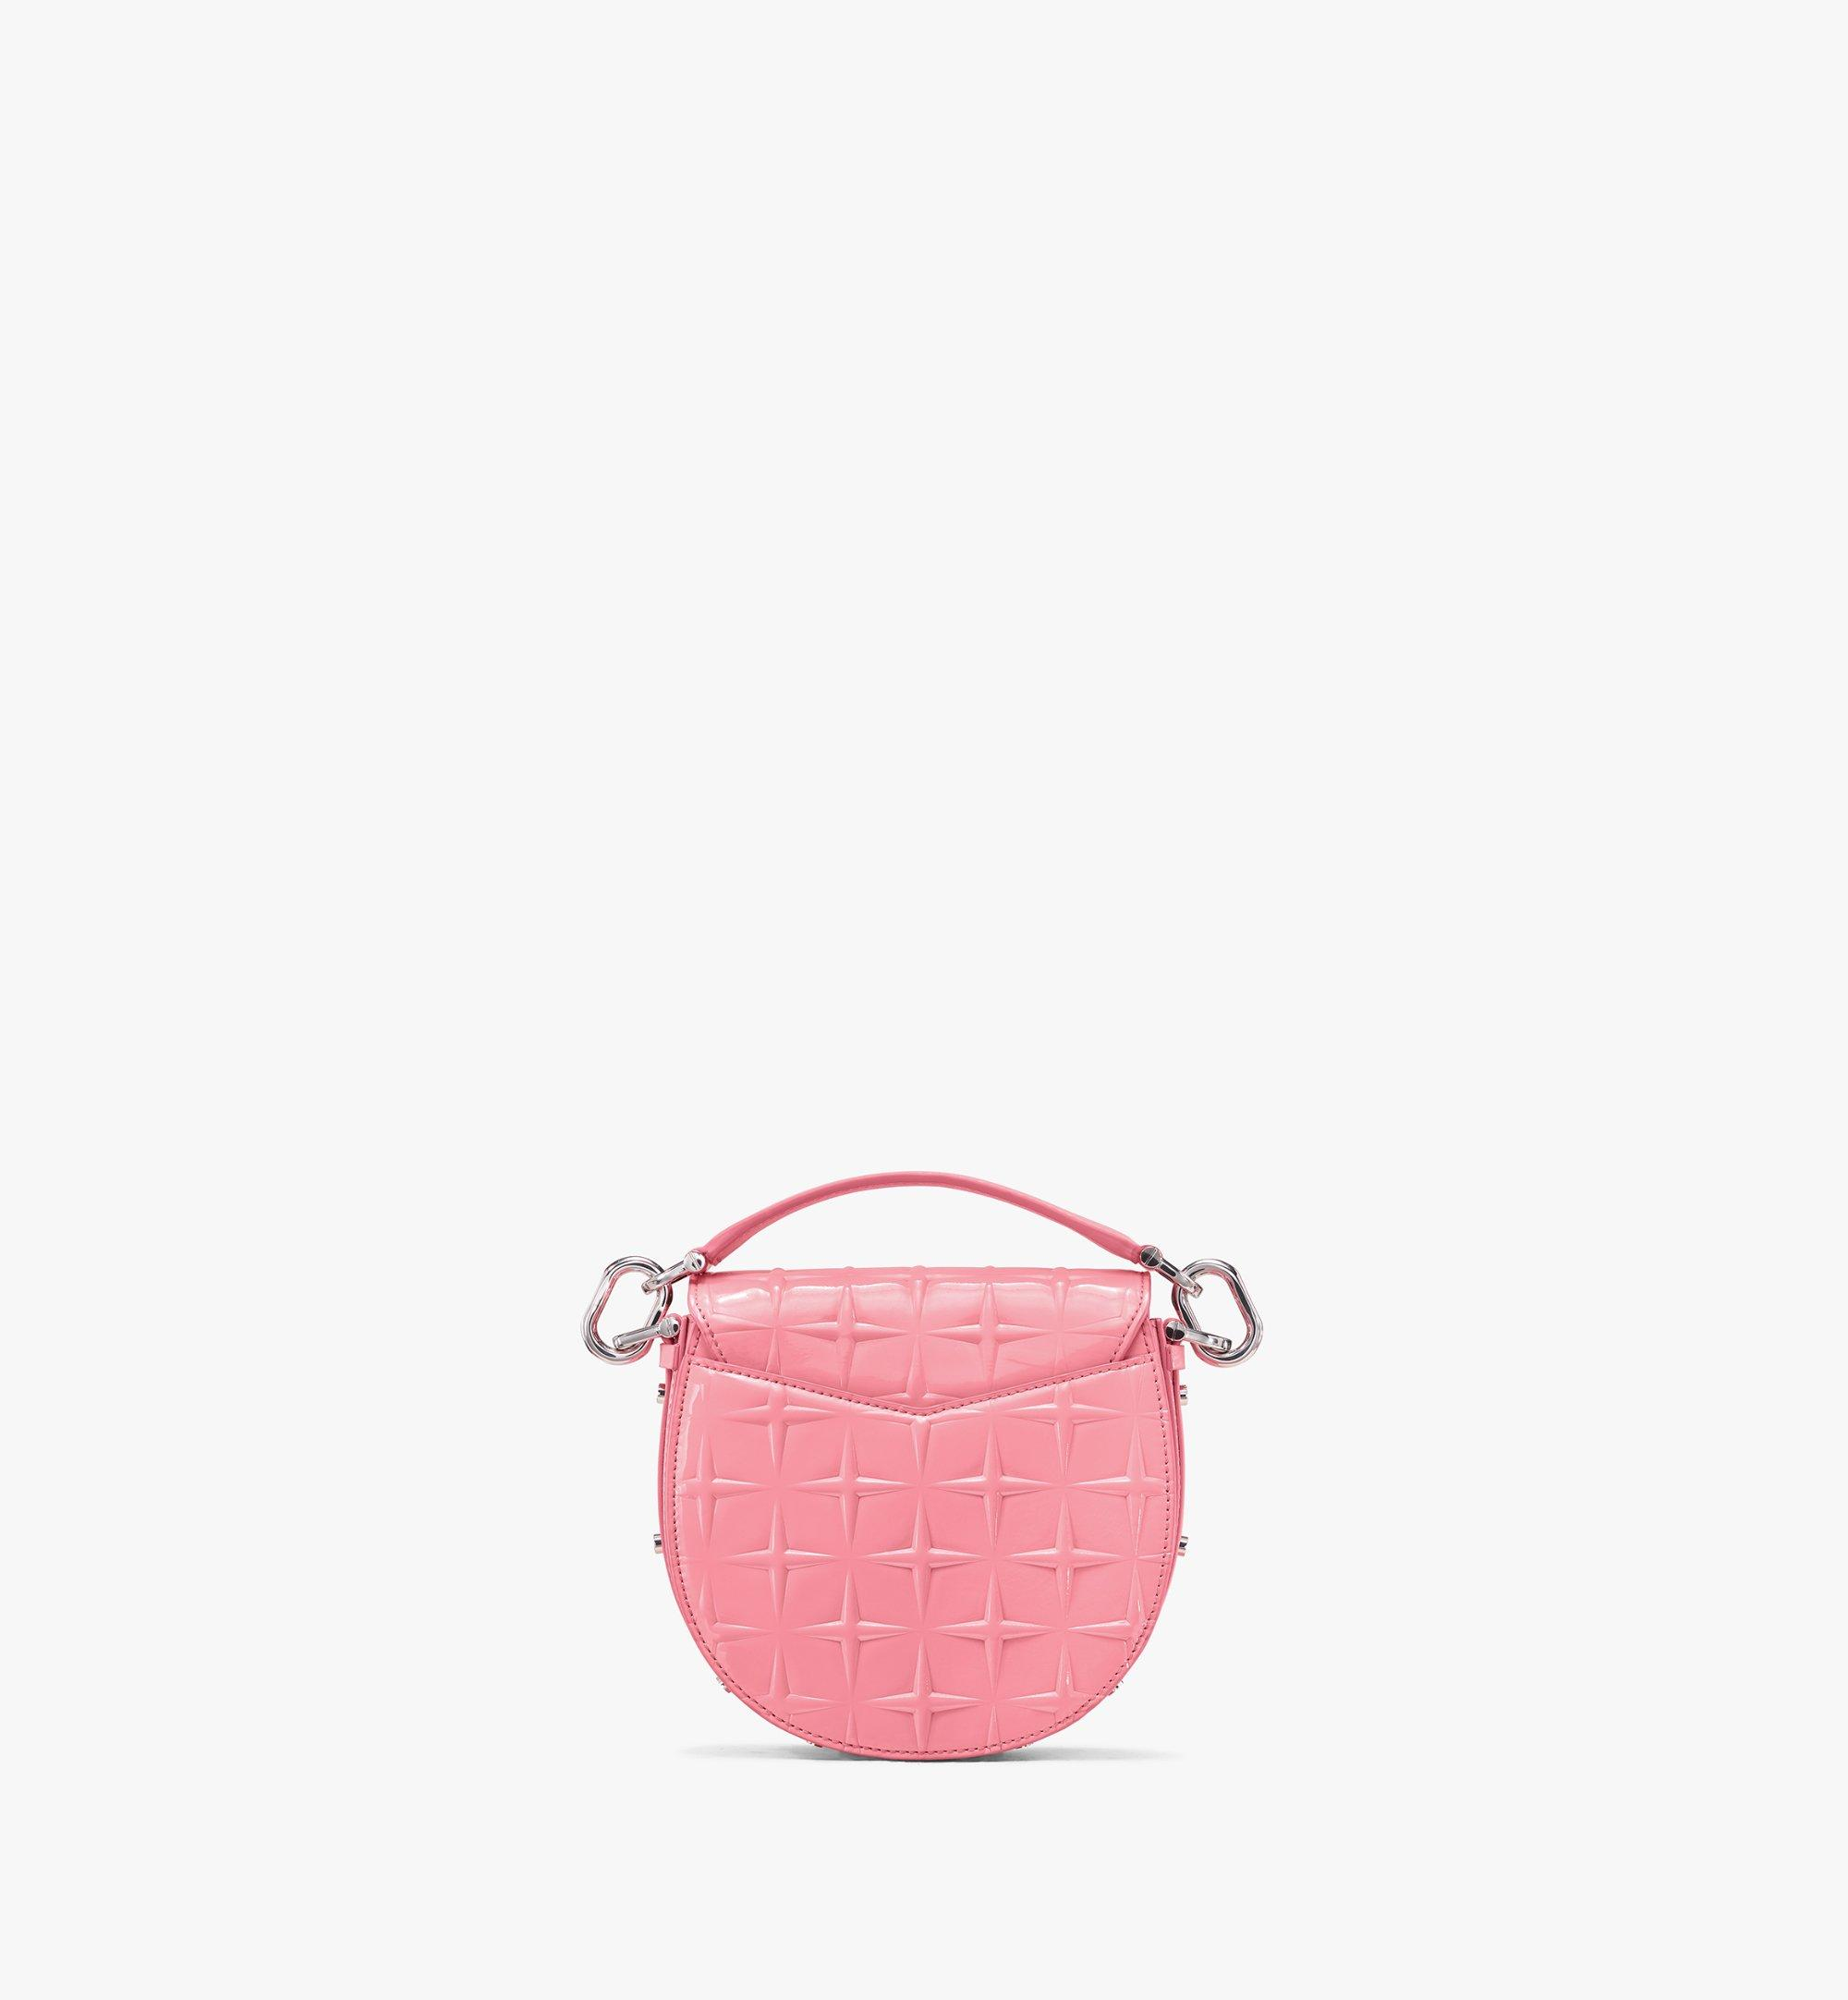 MCM Patricia Shoulder Bag in Diamond Patent Leather Pink MWSASPA14QG001 Alternate View 3